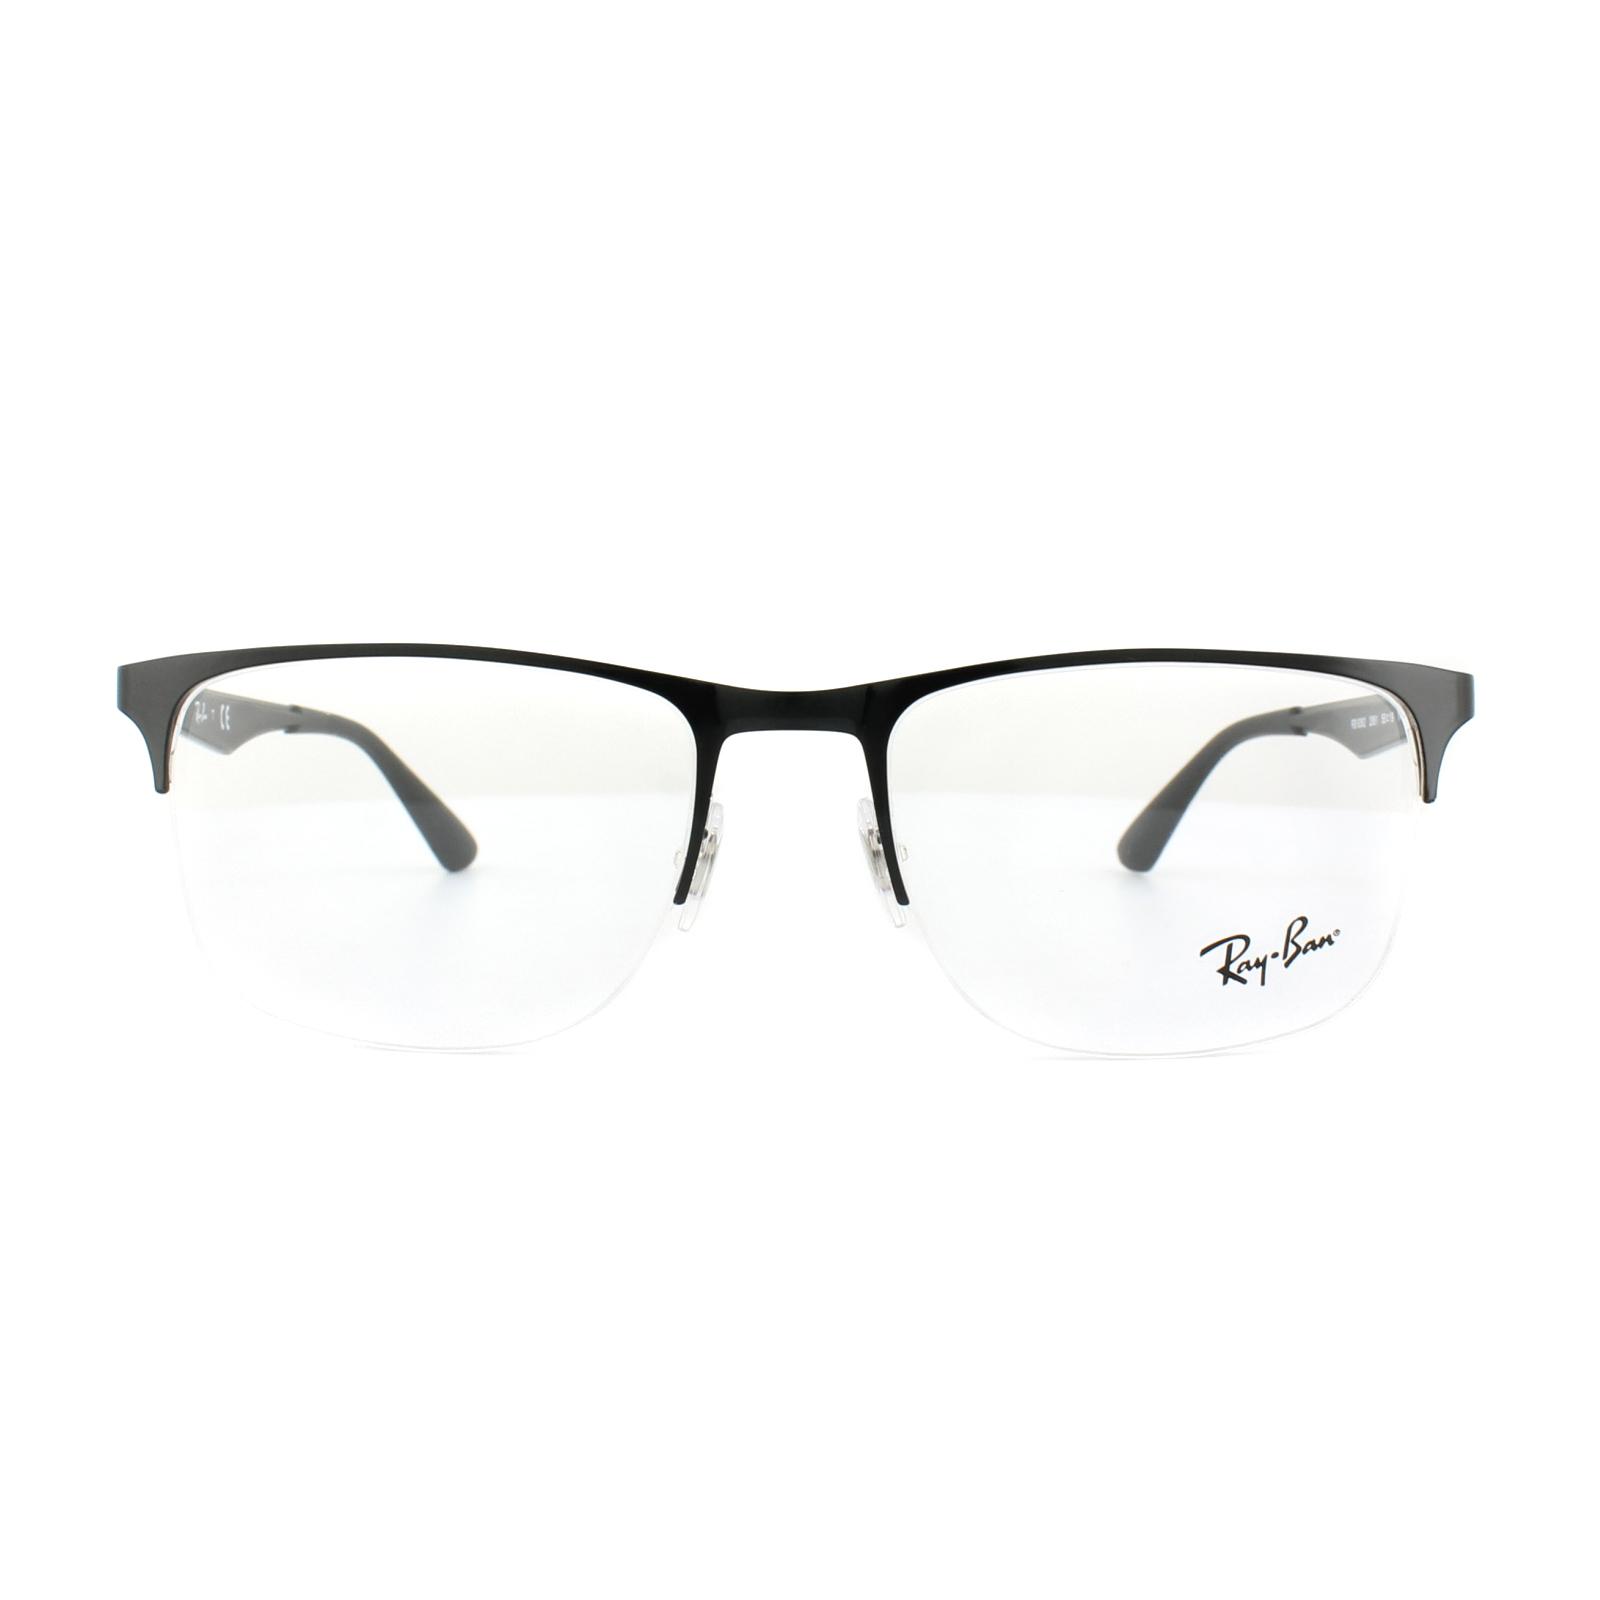 f76a859d90f Sentinel Ray-Ban Glasses Frames RX 6362 2861 Silver Top Shiny Black Mens  55mm